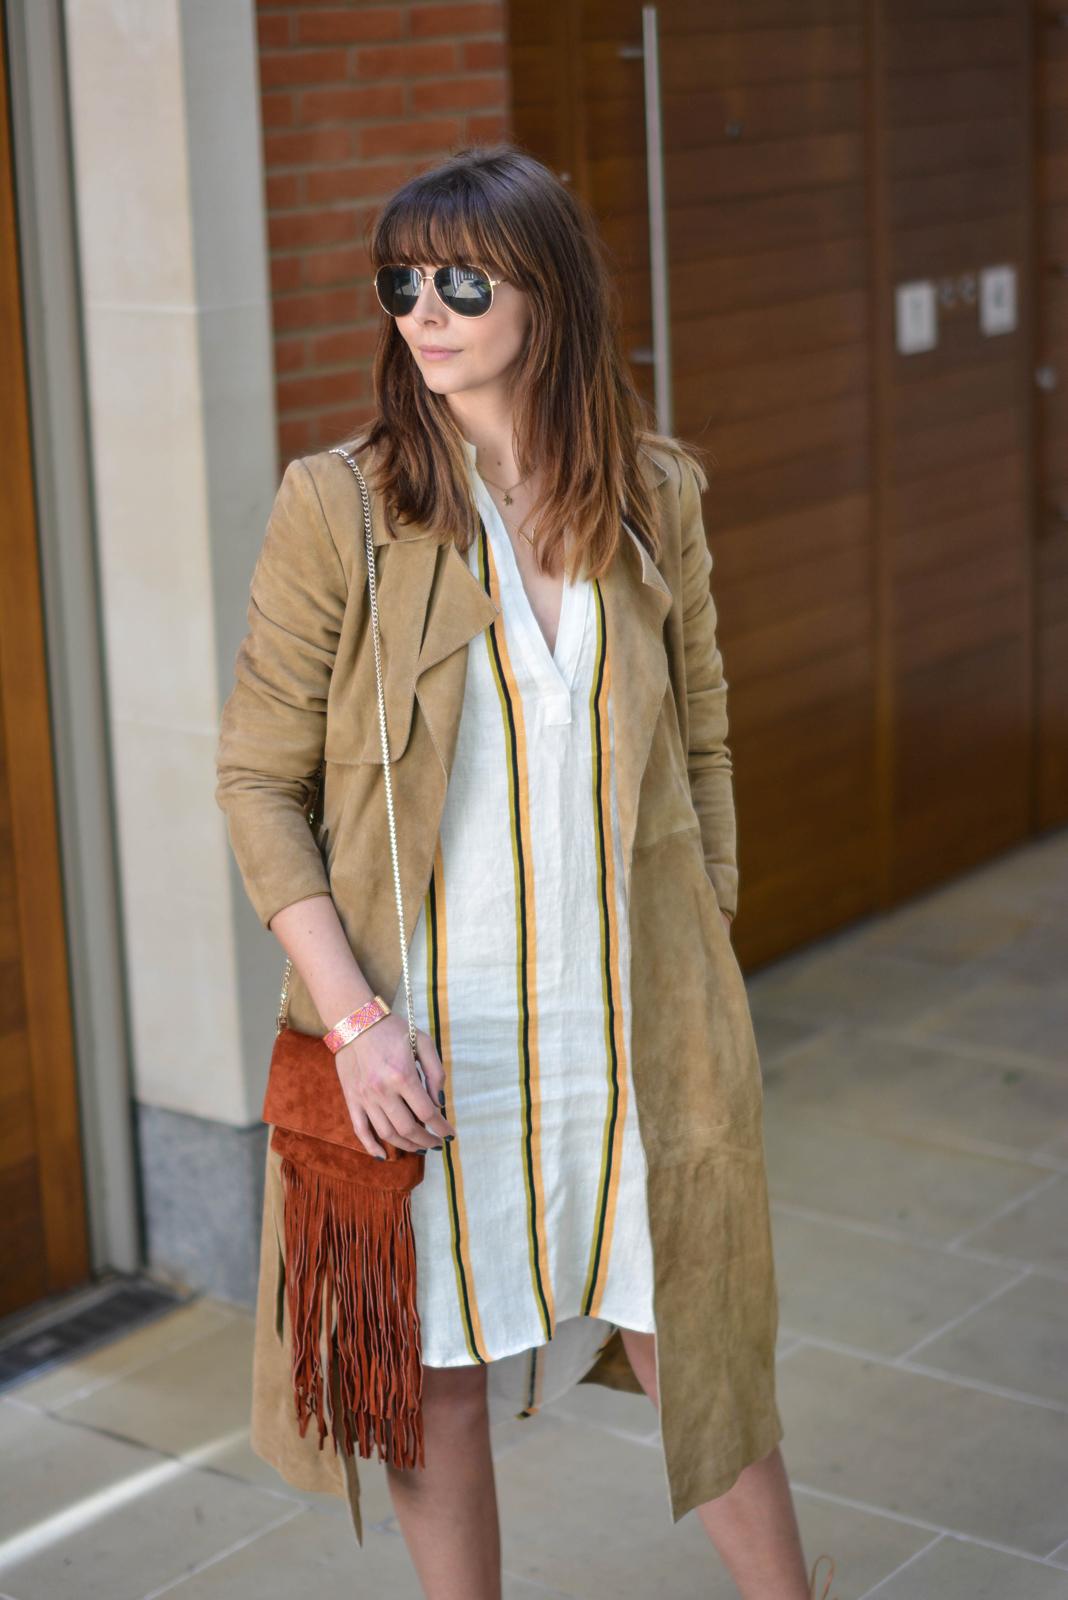 EJSTYLE - Emma Hill wears H&M linen stripe shirt dress, Gestuz suede trench coat, gold aviator sunglasses, Karen Millen suded fringe bag, Stella & Dot bracelet, OOTD